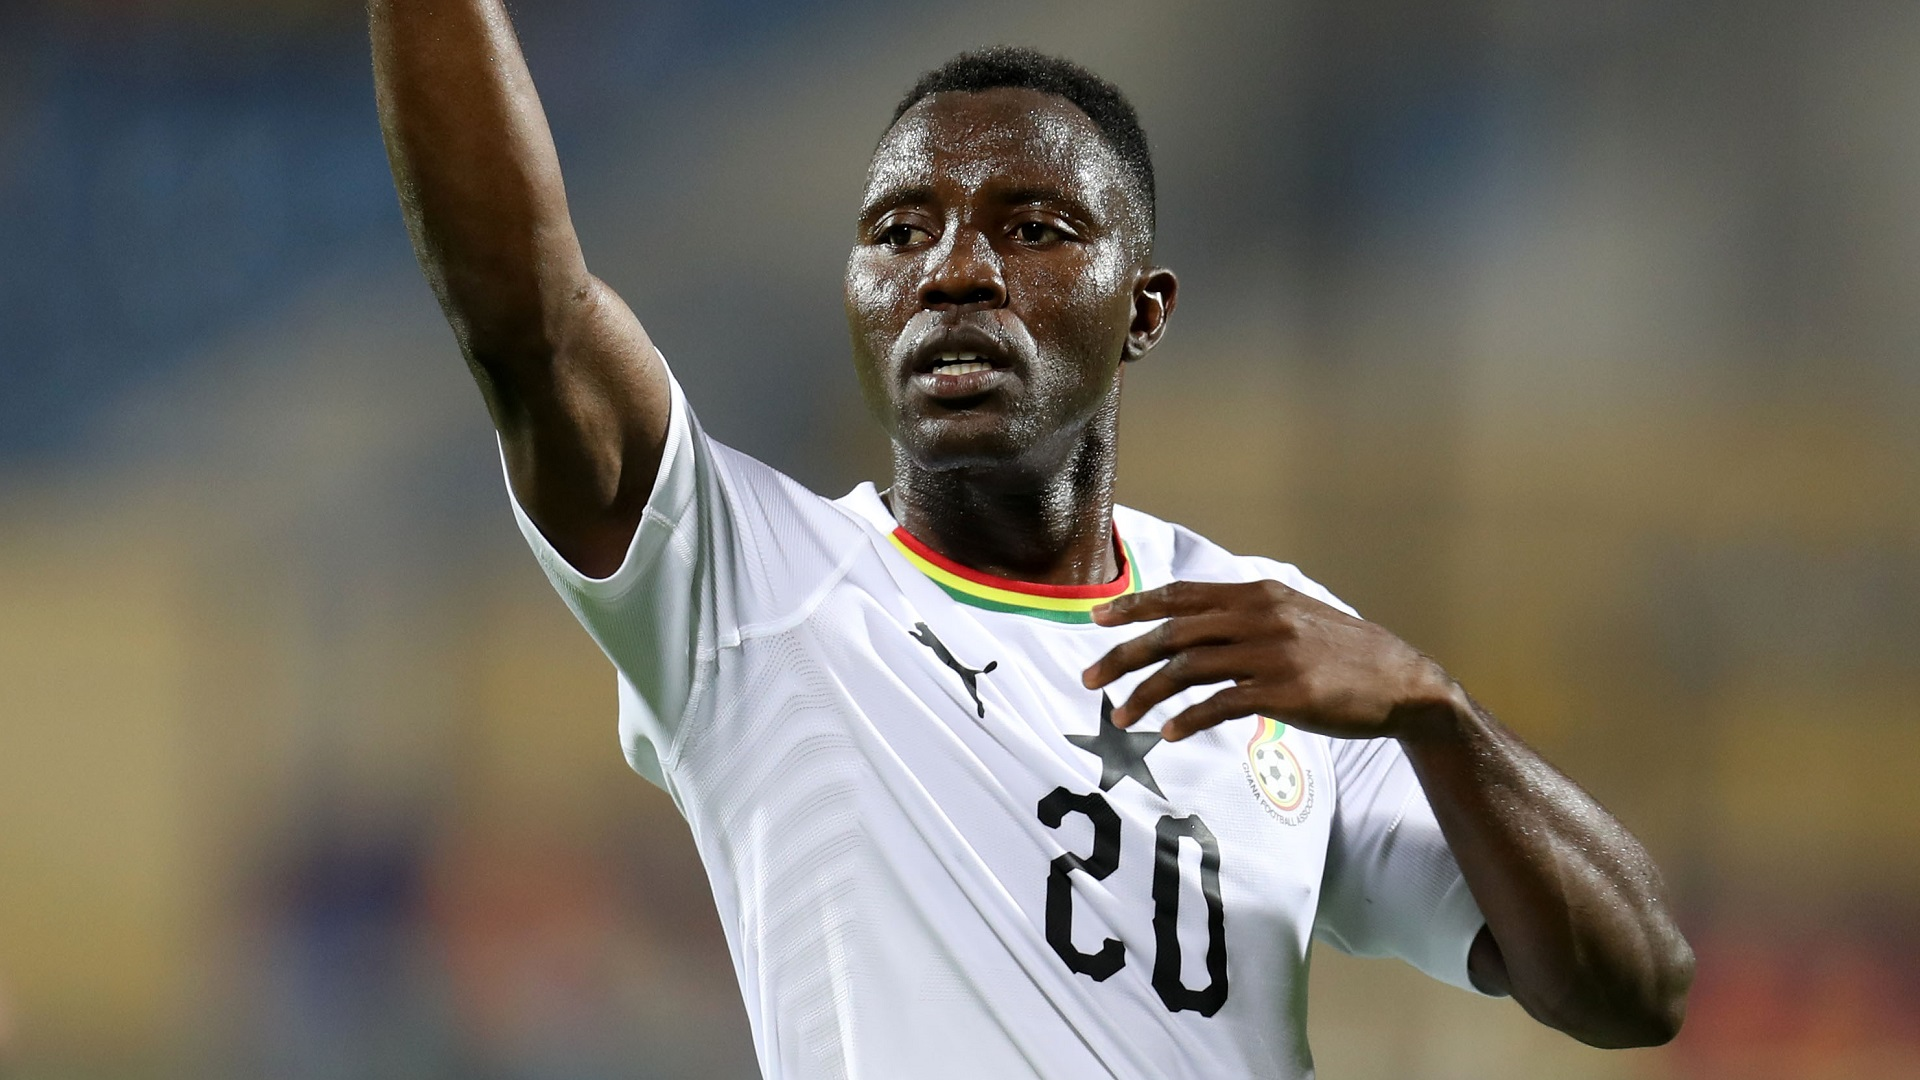 Father of Inter Milan's Kwadwo Asamoah clarifies son's international future    Goal.com